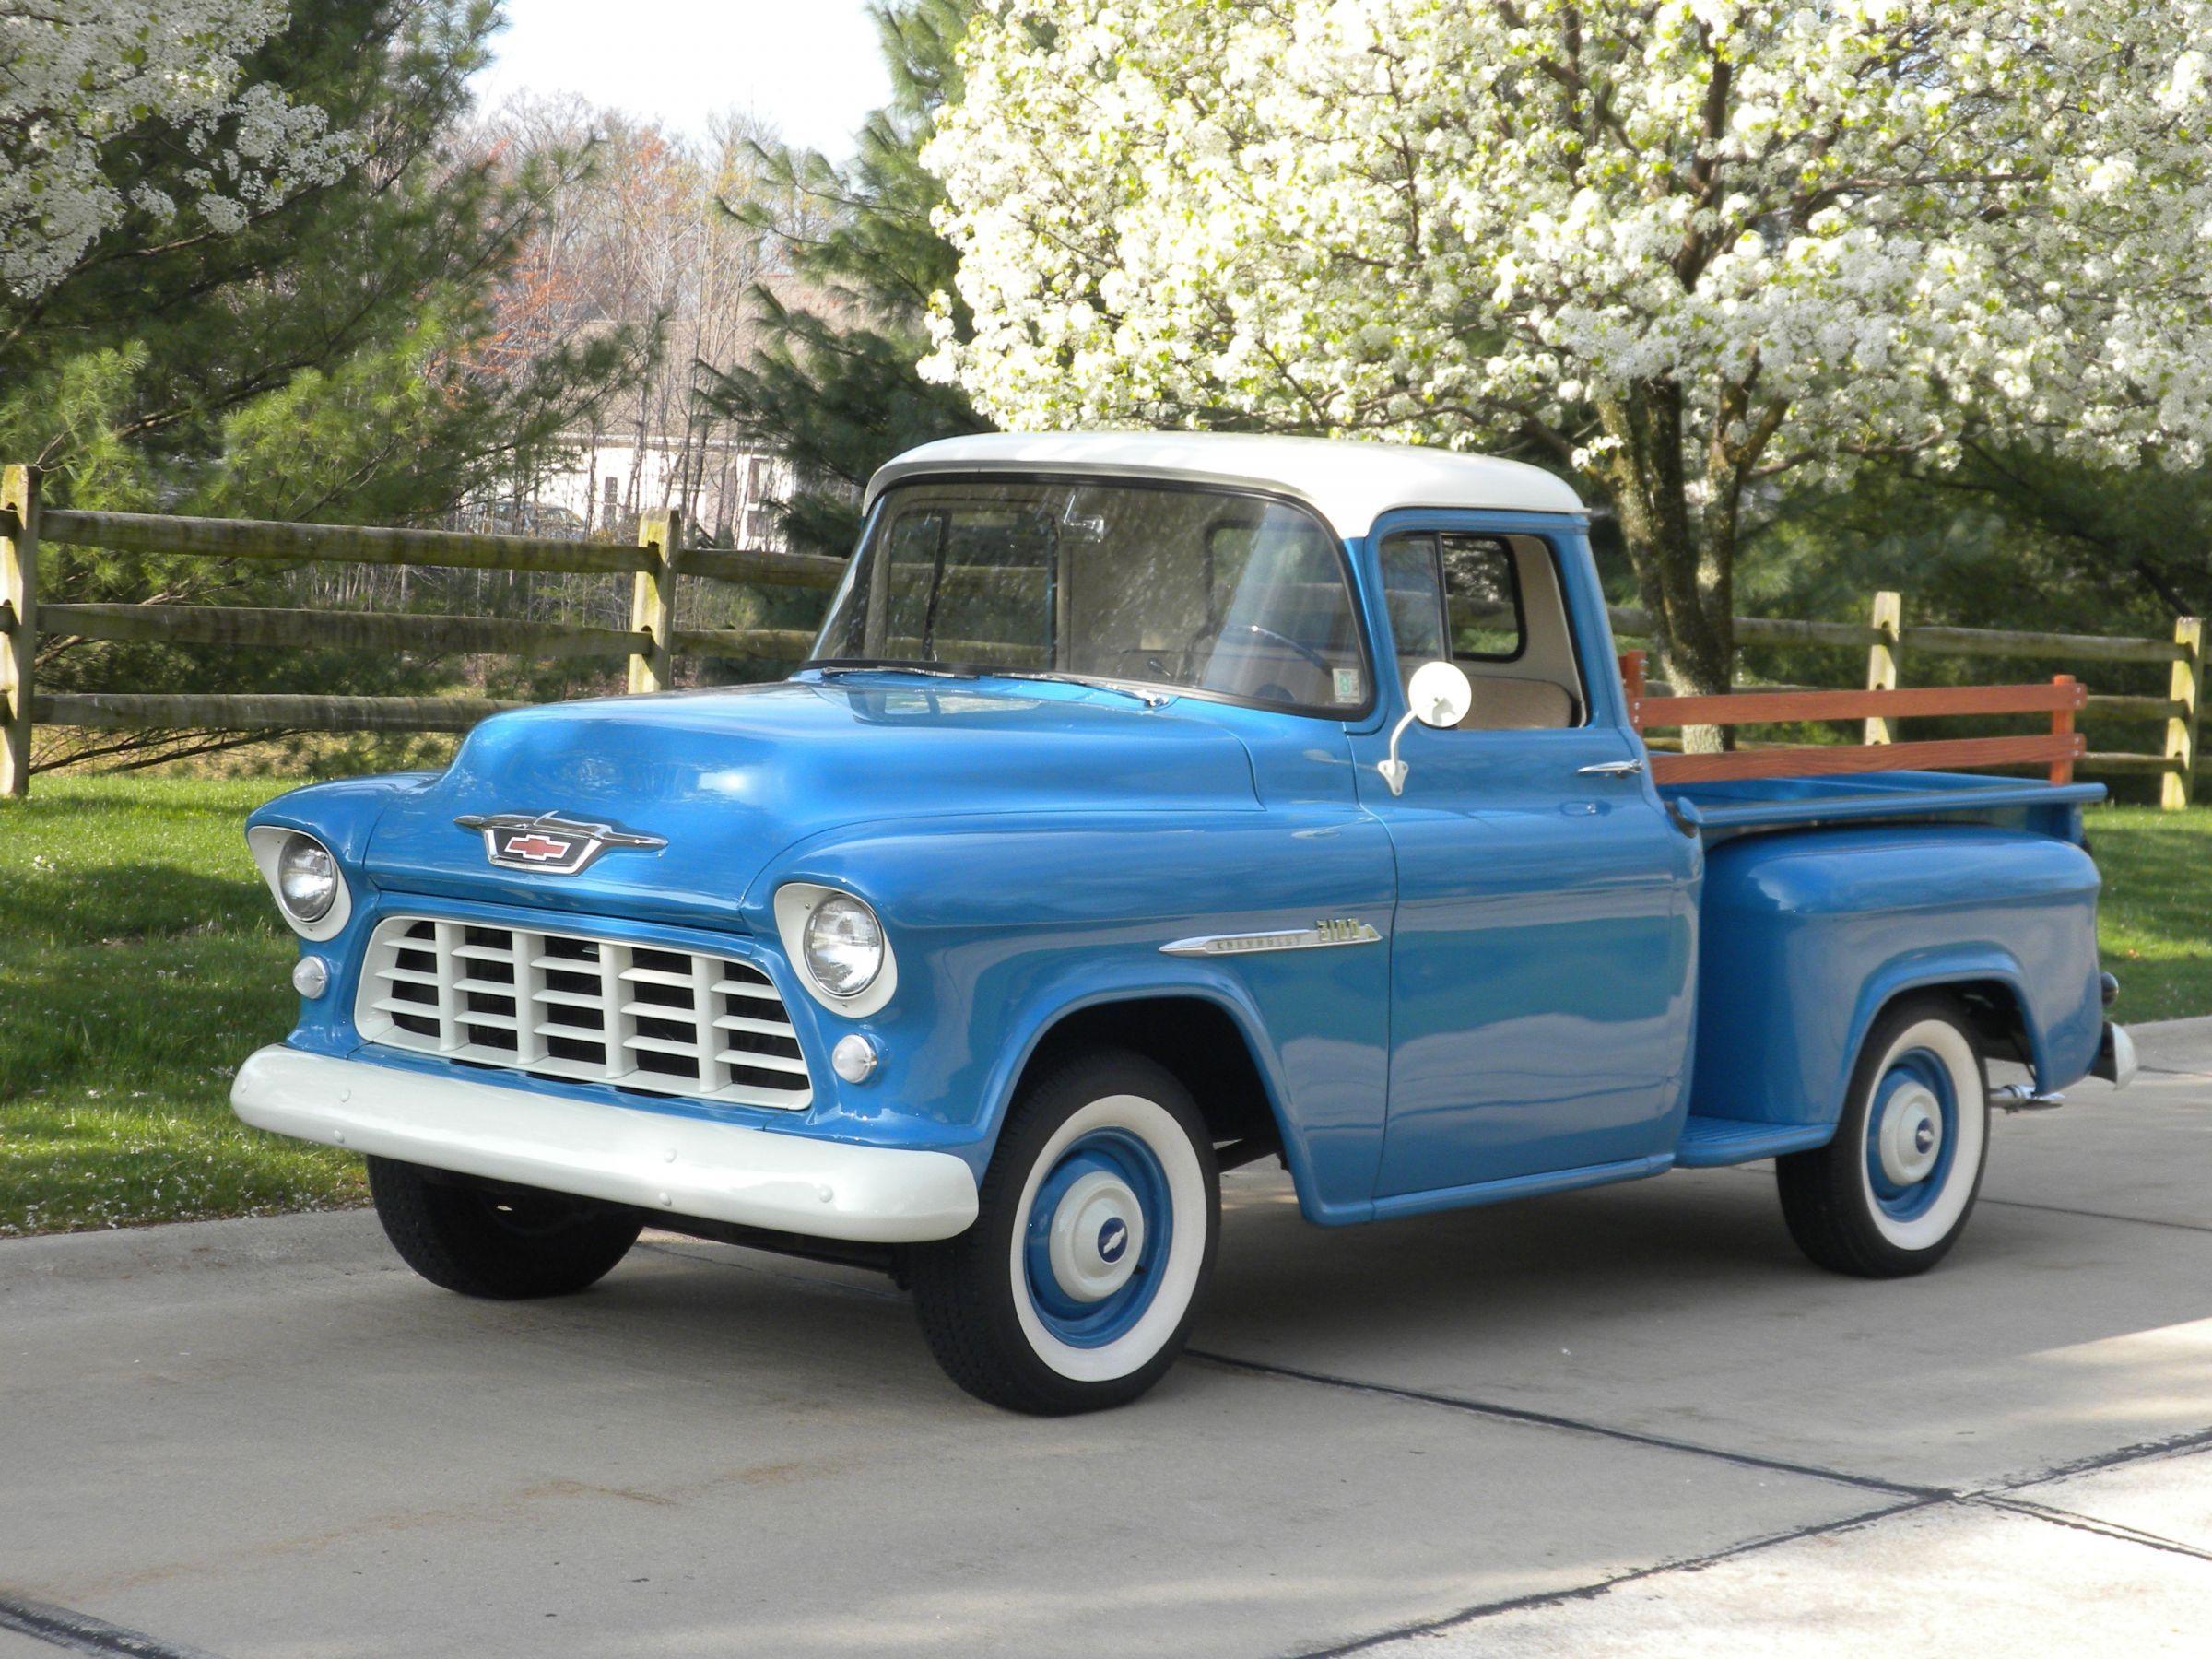 Old Chevrolet Trucks For Sale, The Pickup Truck's